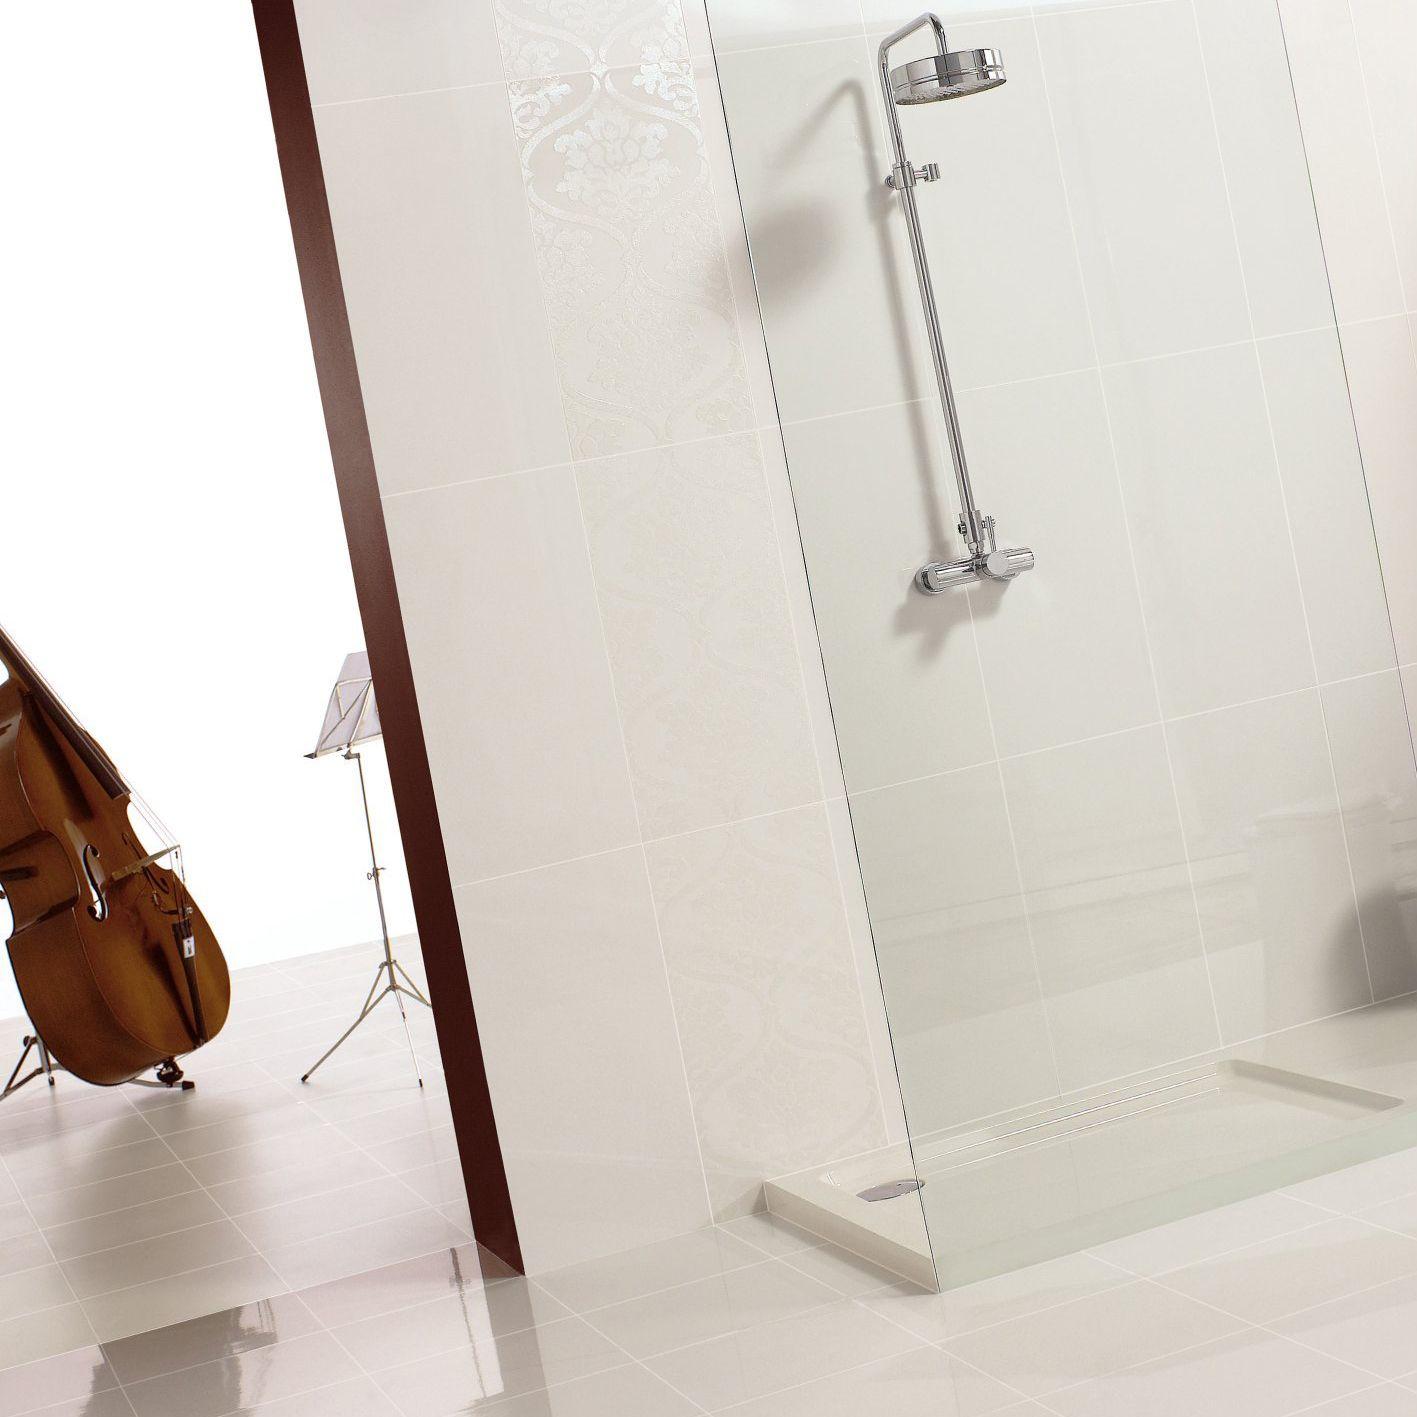 Branco Floor Tiles Add A Sleek Look To Any Bathroom White